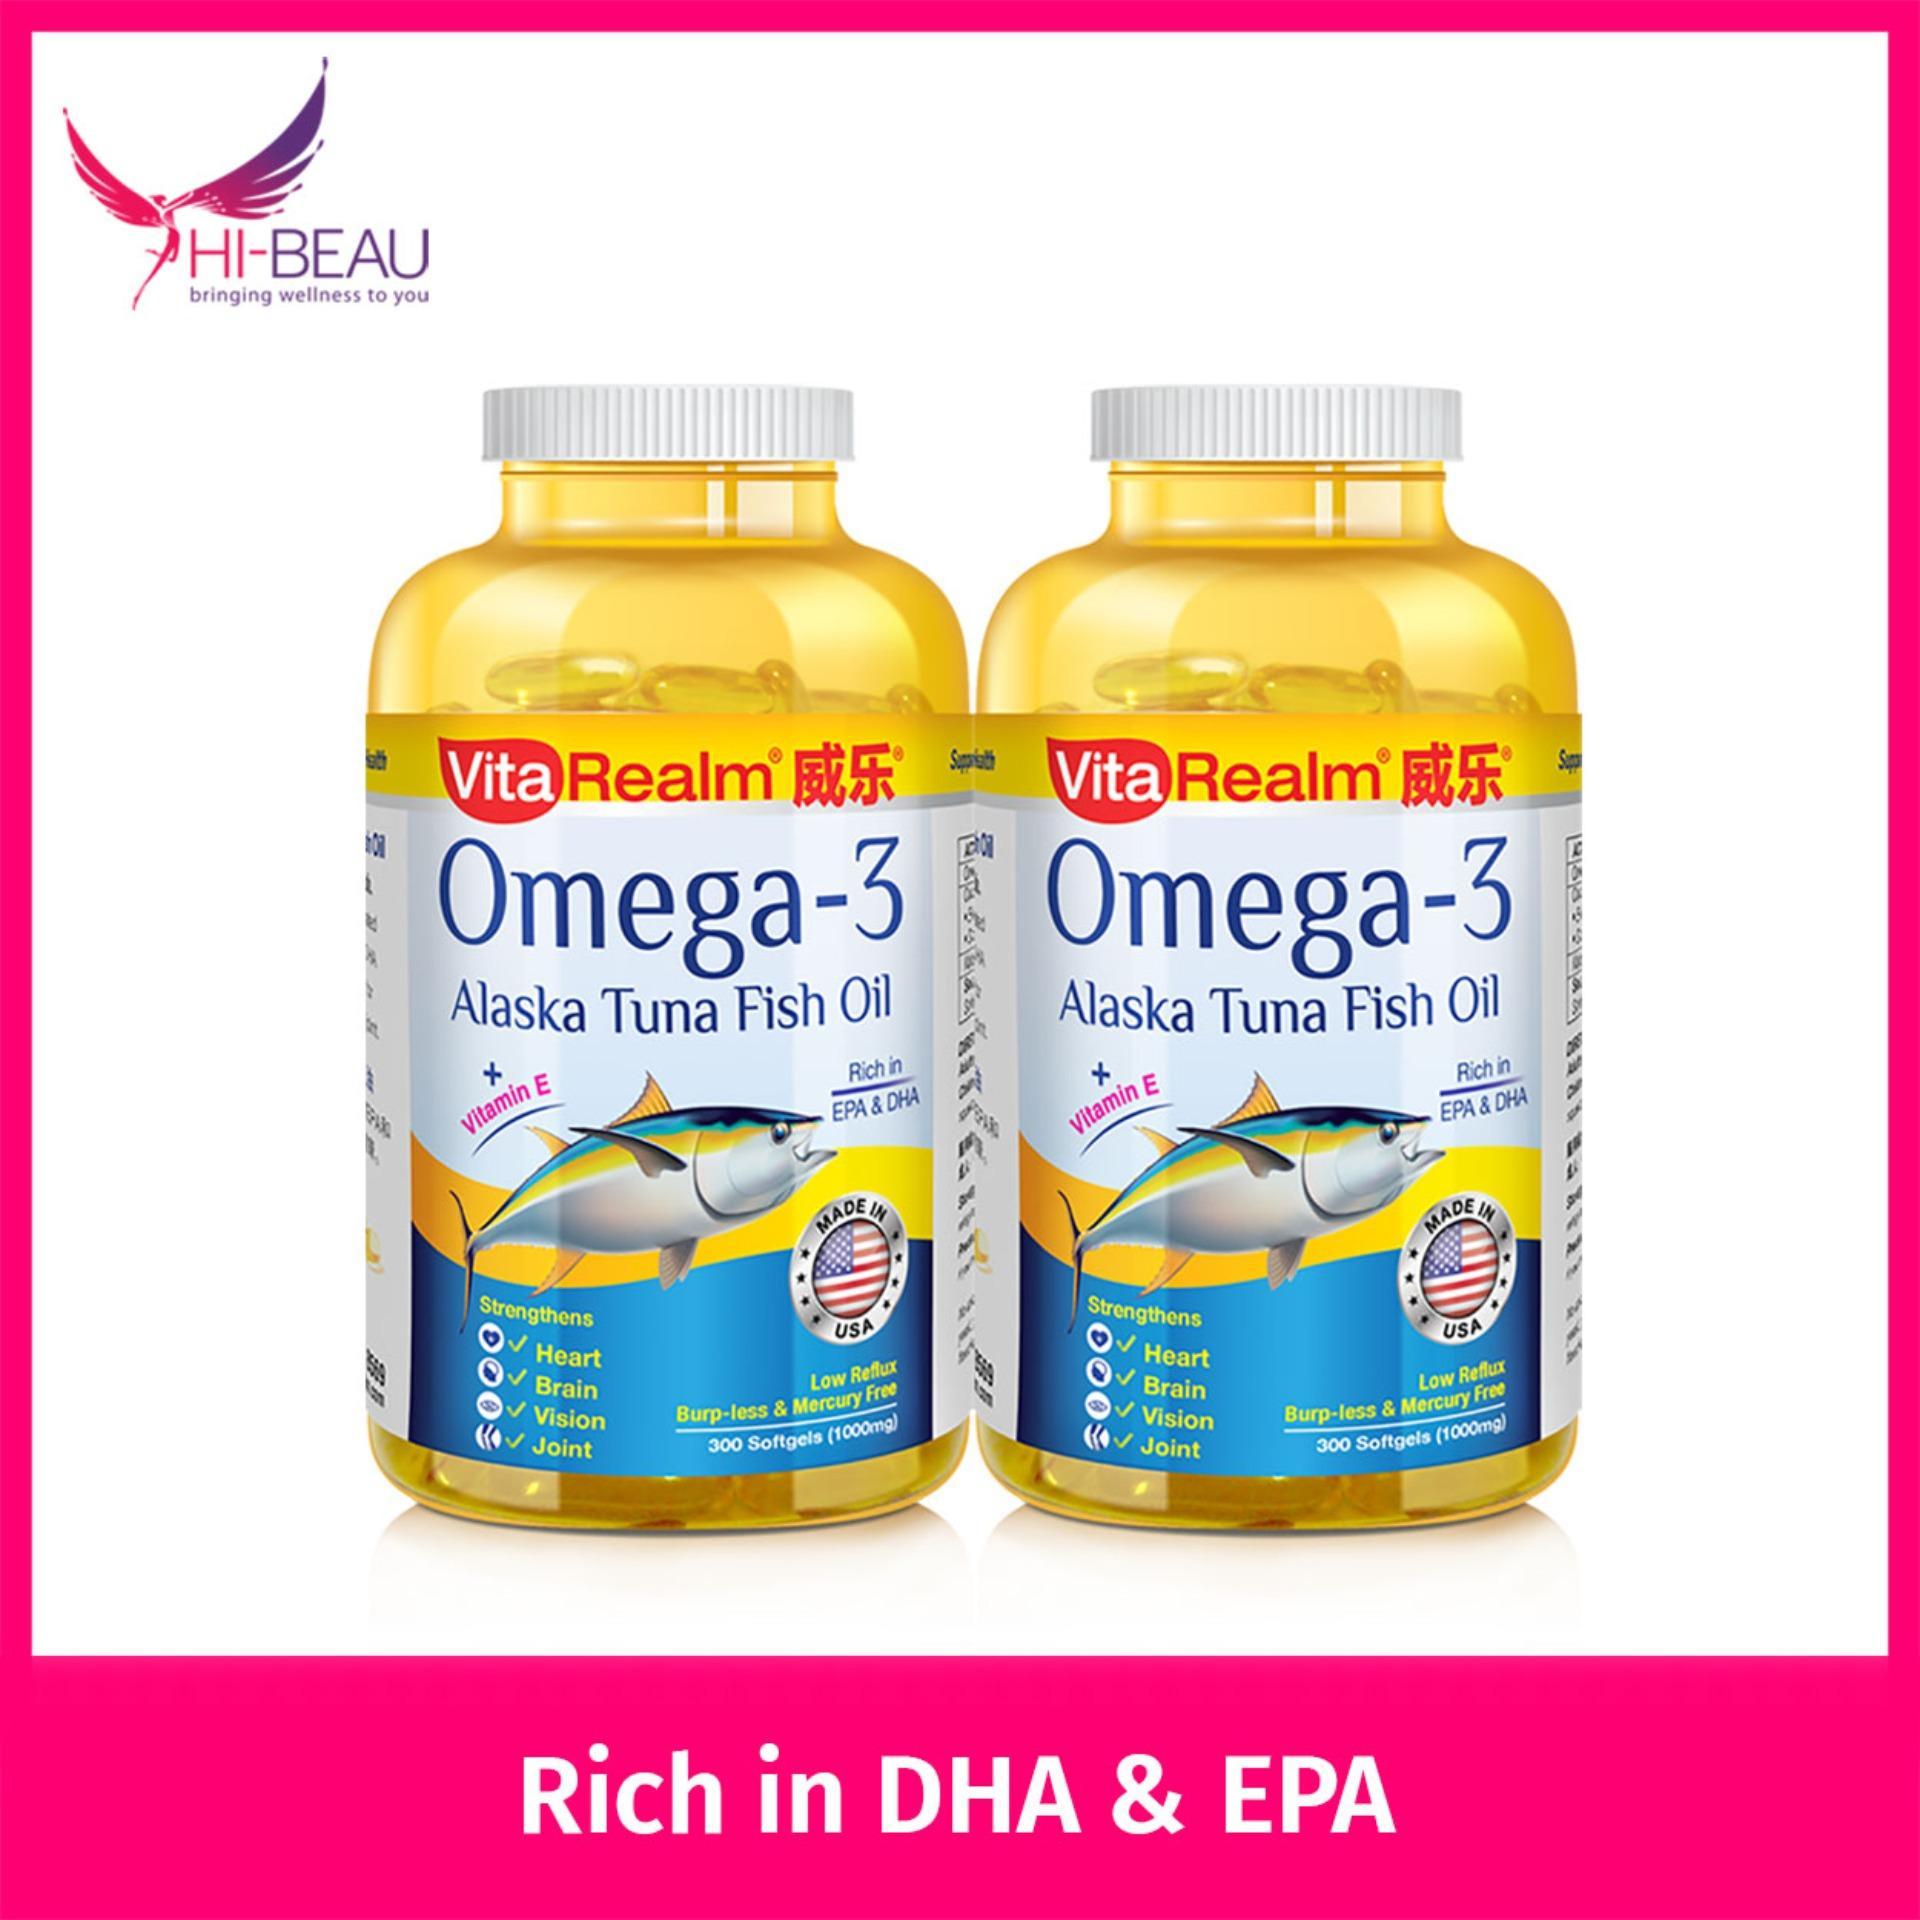 Heart Blood Pressure Buy At Best Price In Wellness Omega 3 1000 Mg 150 1 Get Free Vitarealm Alaska Tuna Fish Oil Bundle Of 2